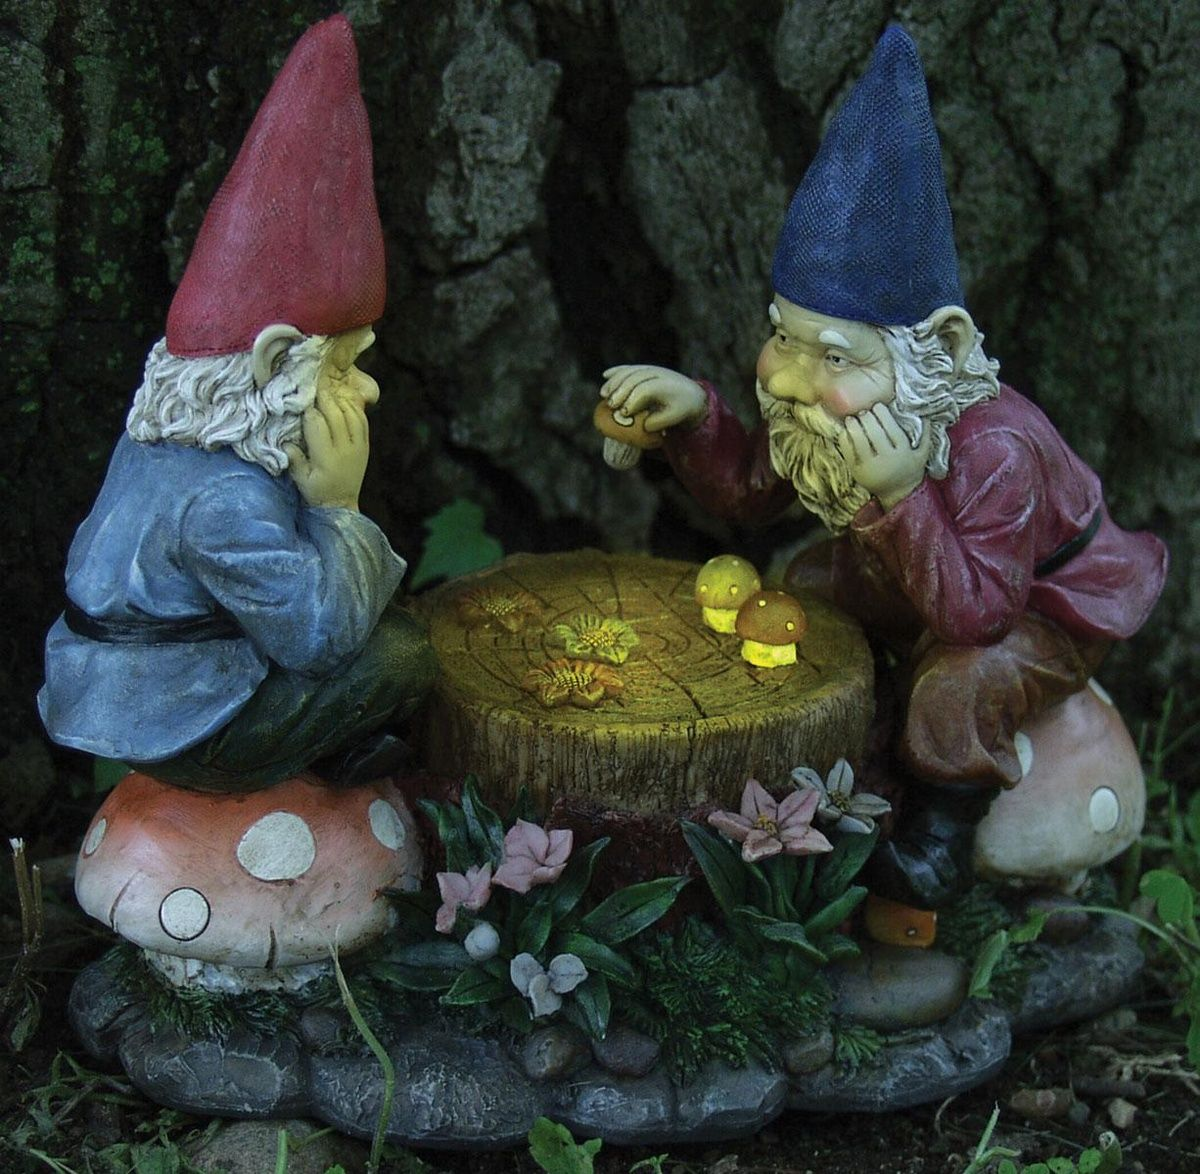 lawn outdoor yard present Finished Ceramic Gnome sun room decor centerpiece gnomeo flower bed porch decoration juliet gnome